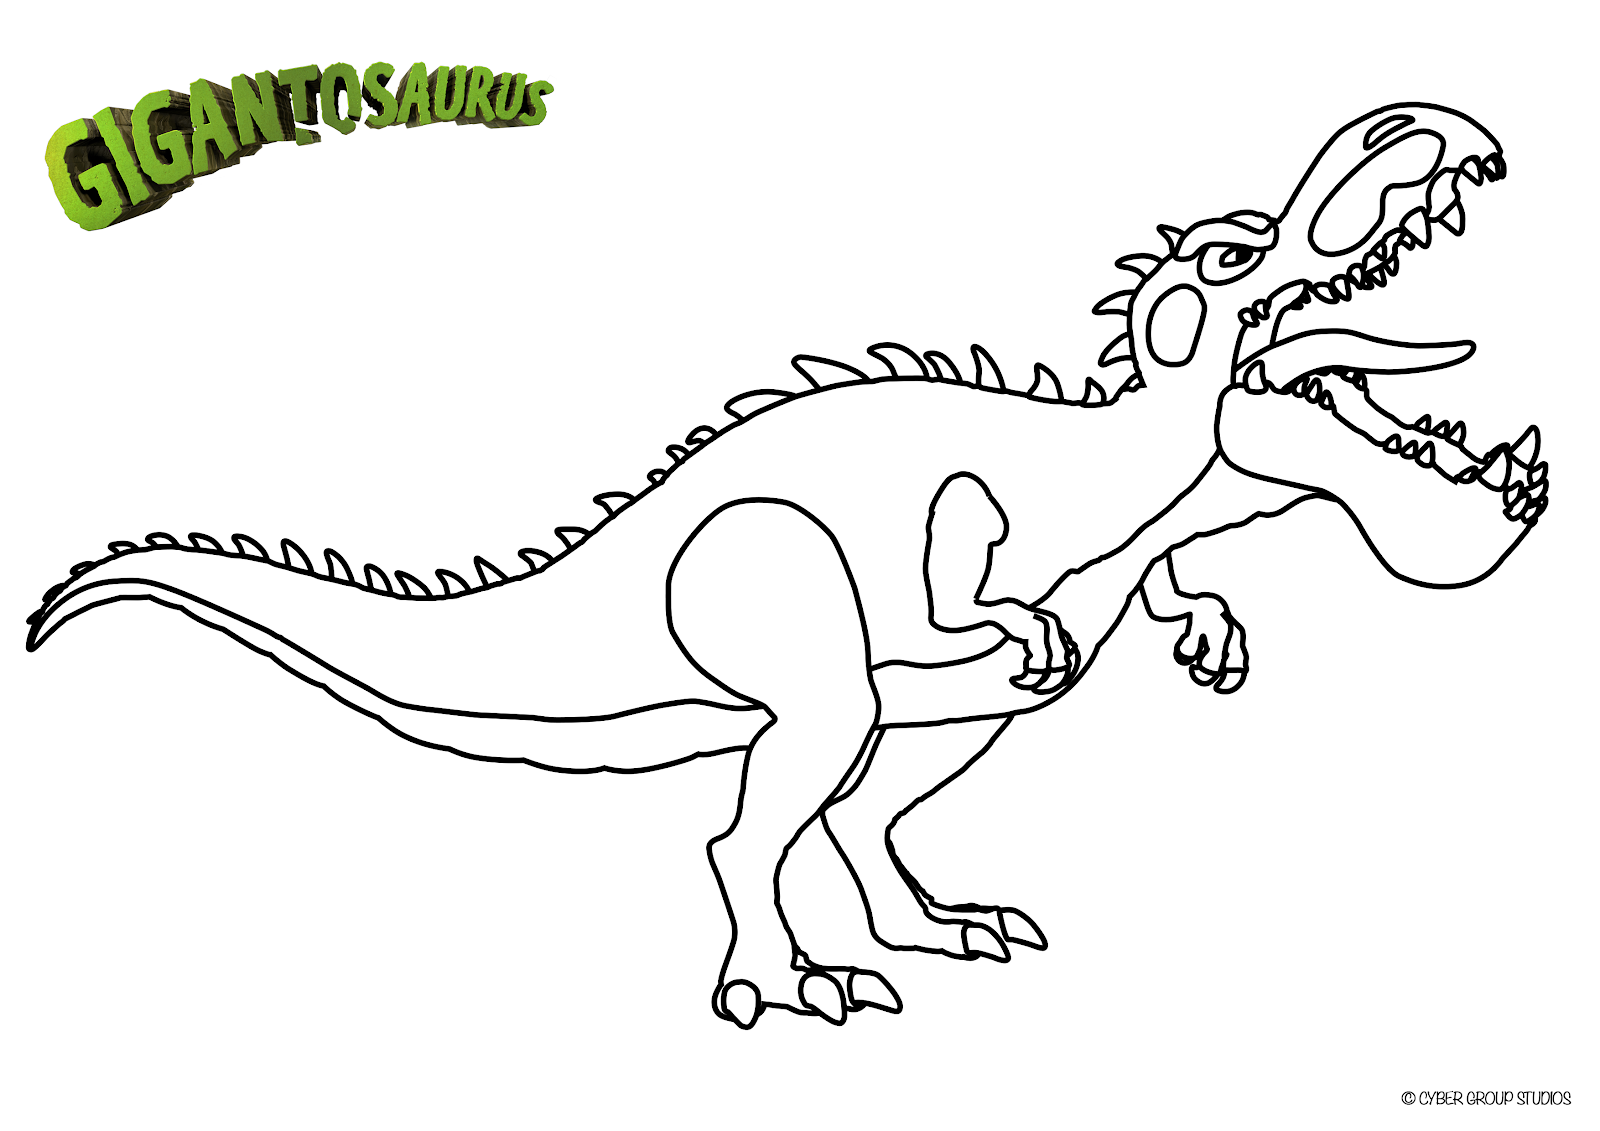 Gigantosaurus on Disney Junior Free Printables